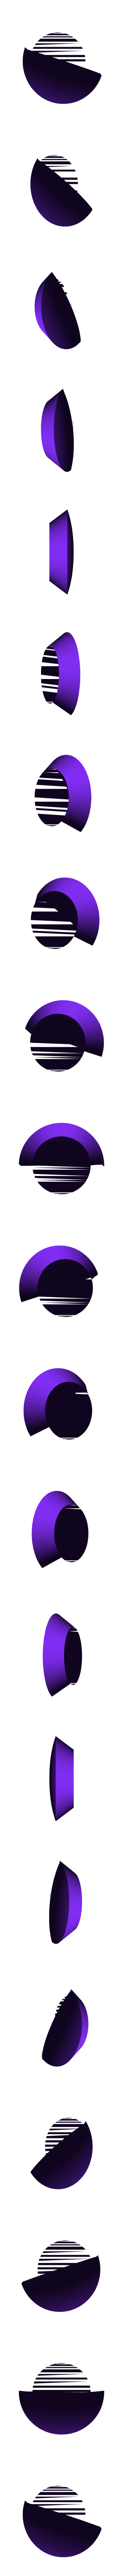 hat spot top.stl Download free STL file Toadette from Mario games - Multi-color • 3D printing design, bpitanga